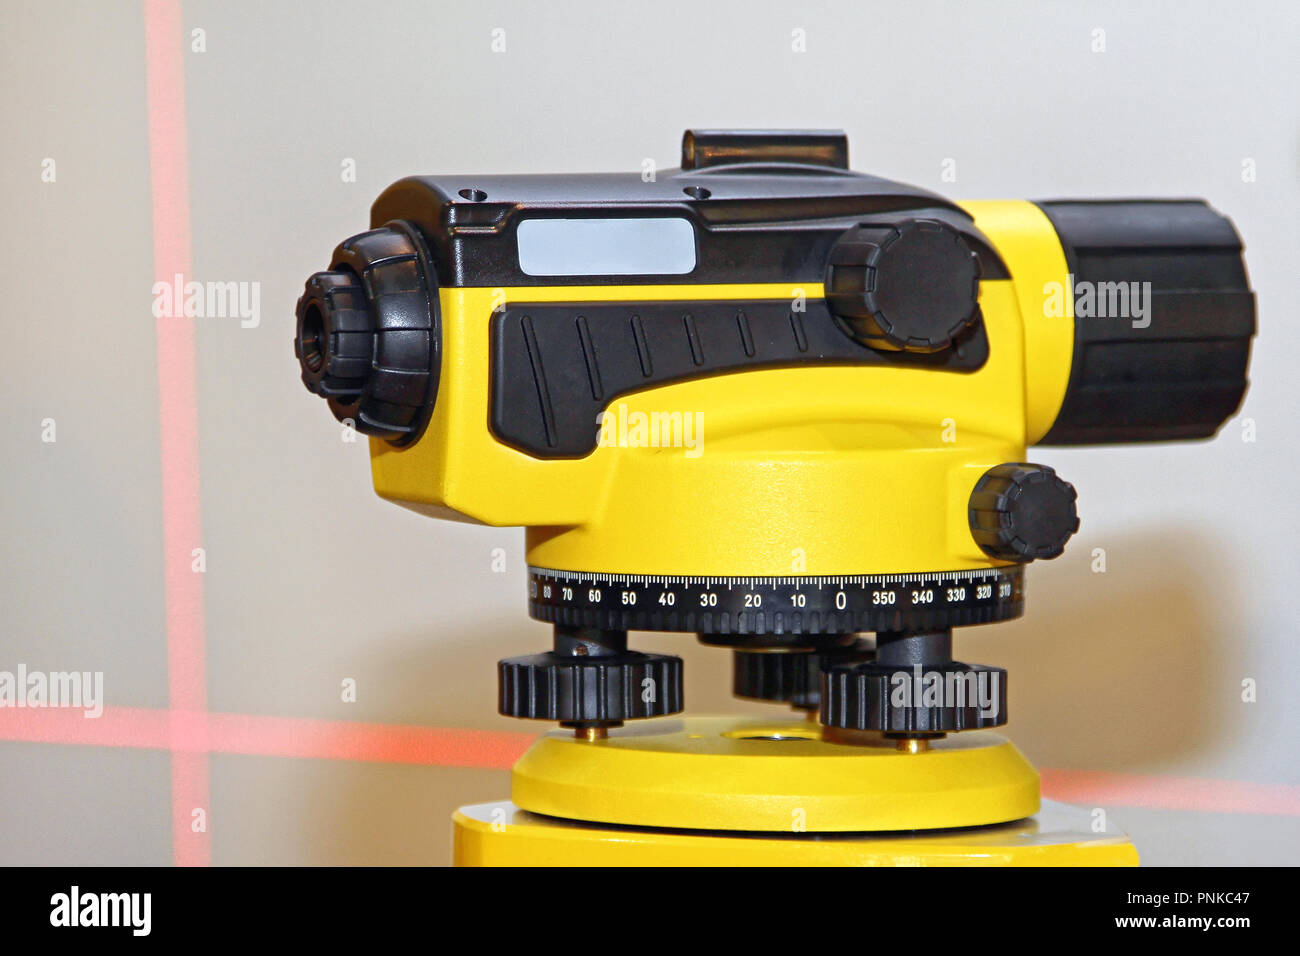 laser level measurement device for construction site stock photo